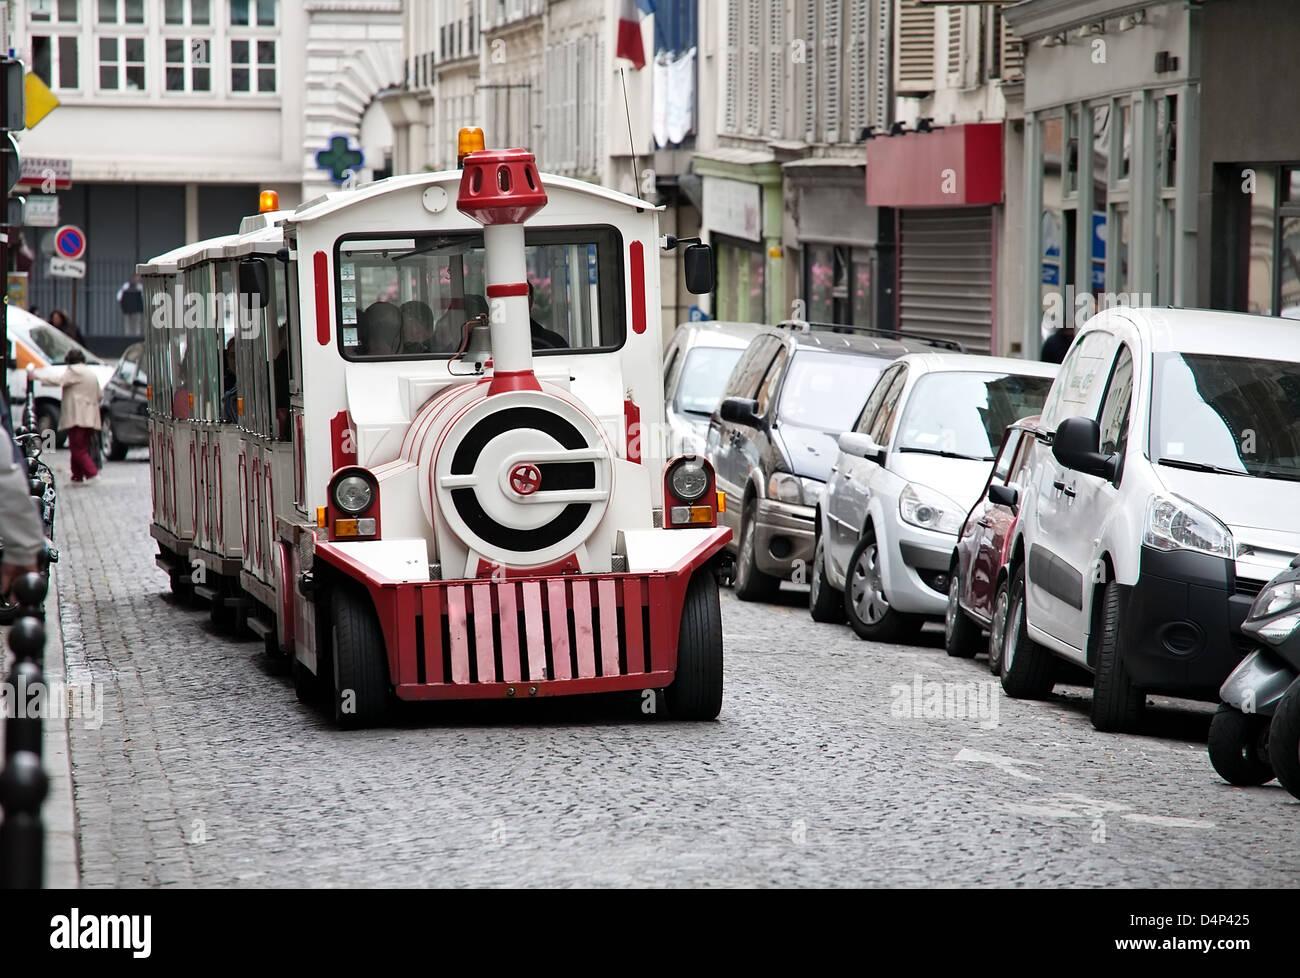 small city tour tourist train on street of old Paris - Stock Image